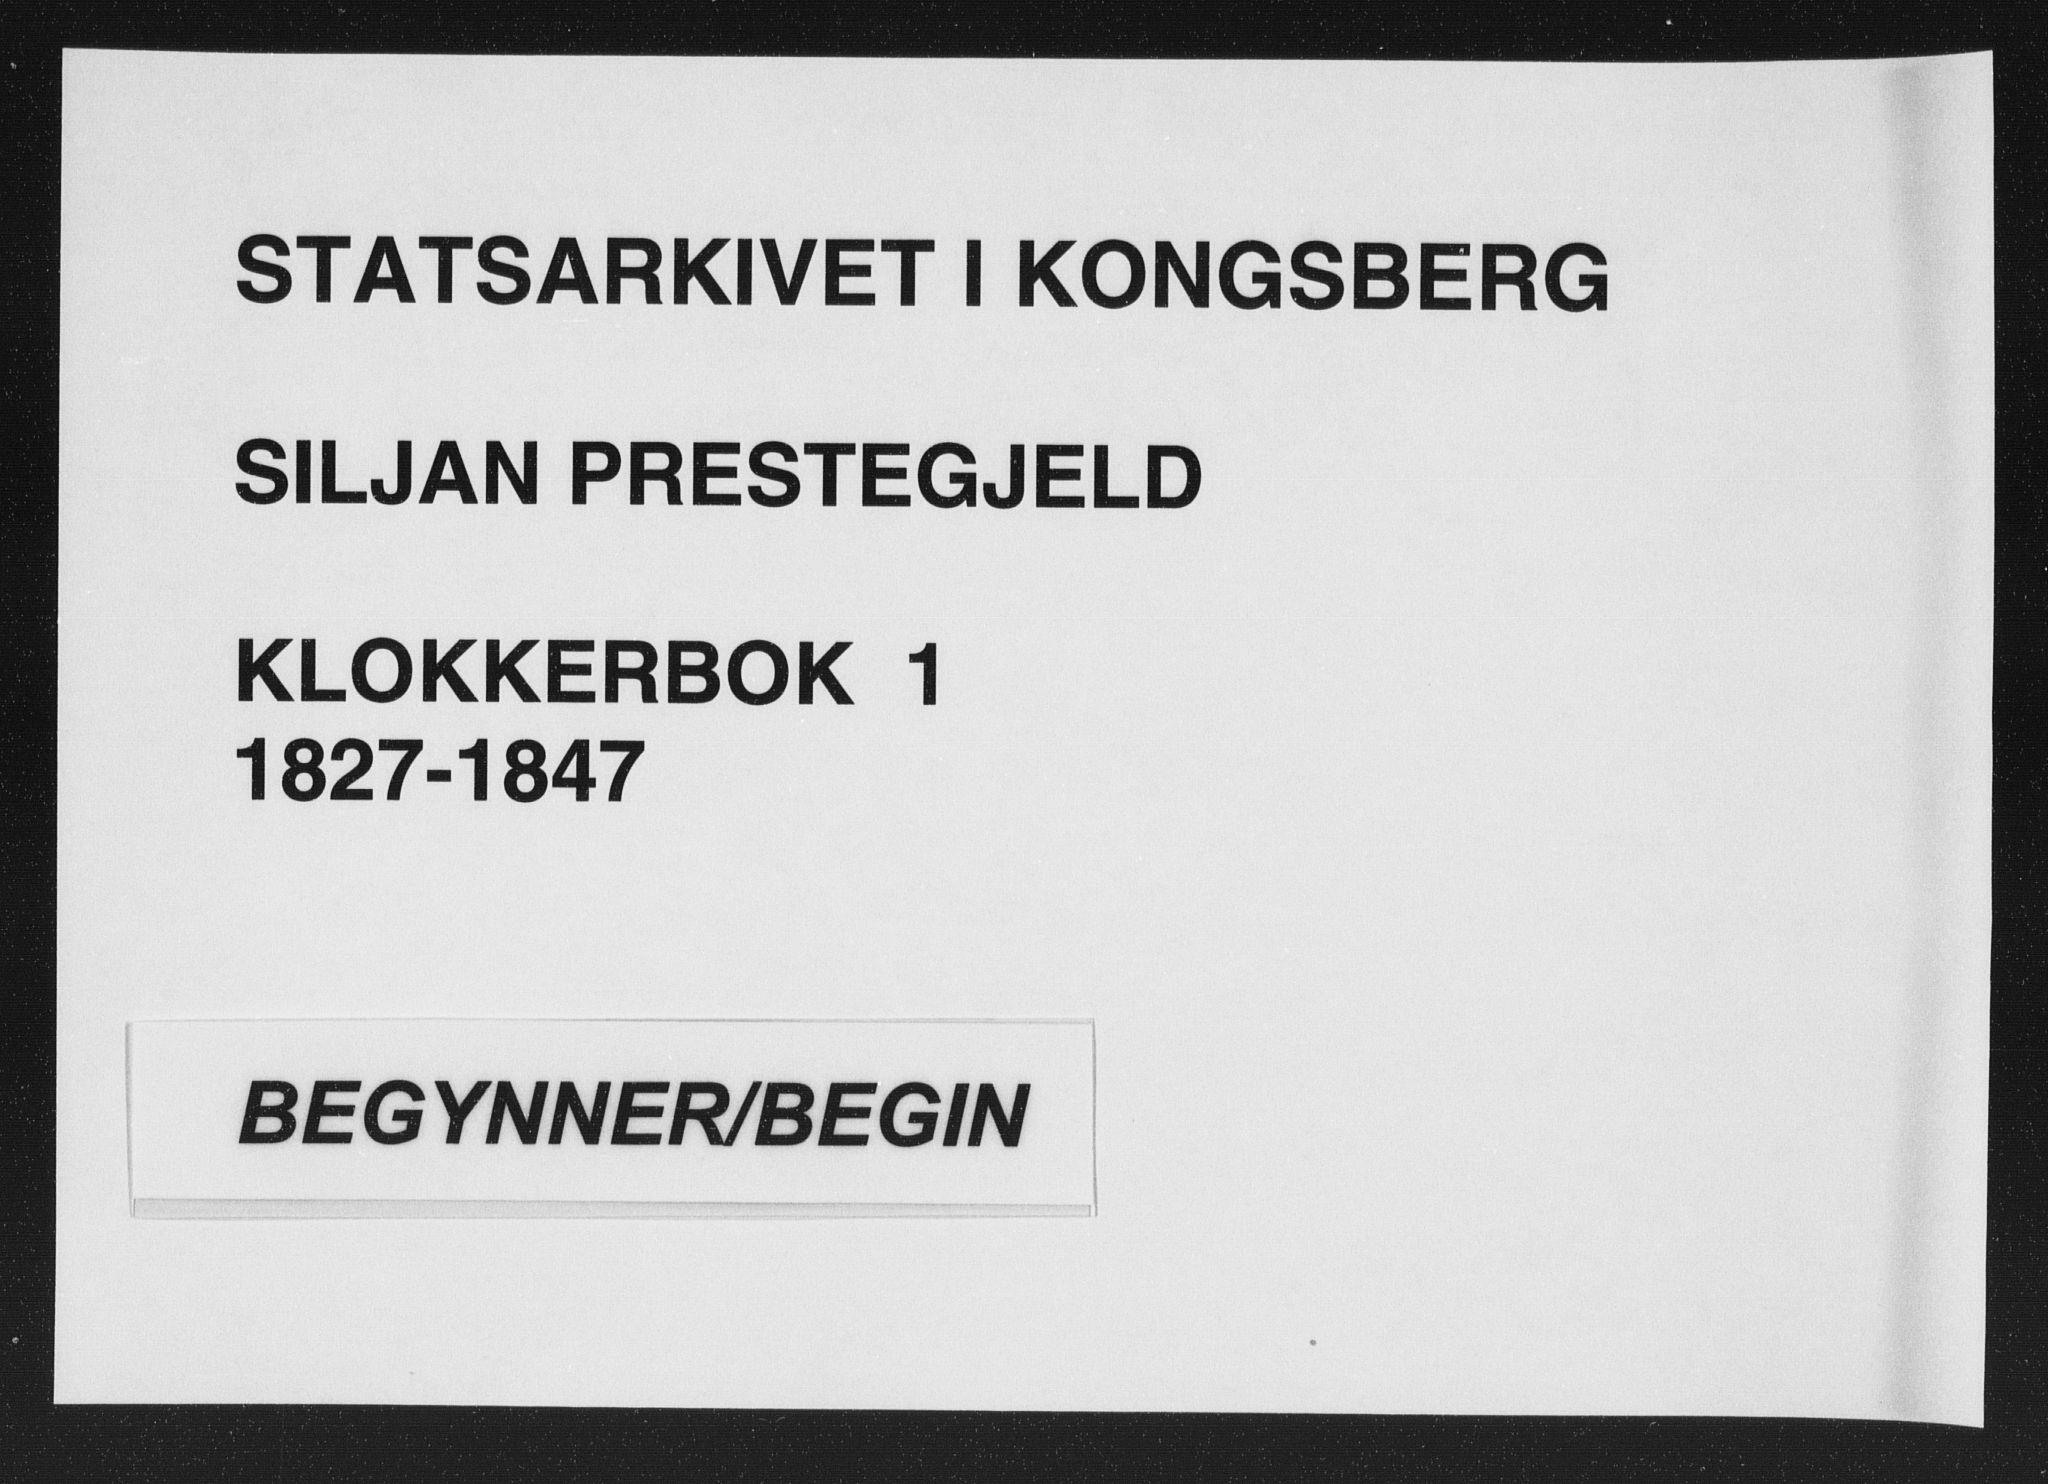 SAKO, Siljan kirkebøker, G/Ga/L0001: Klokkerbok nr. 1, 1827-1847